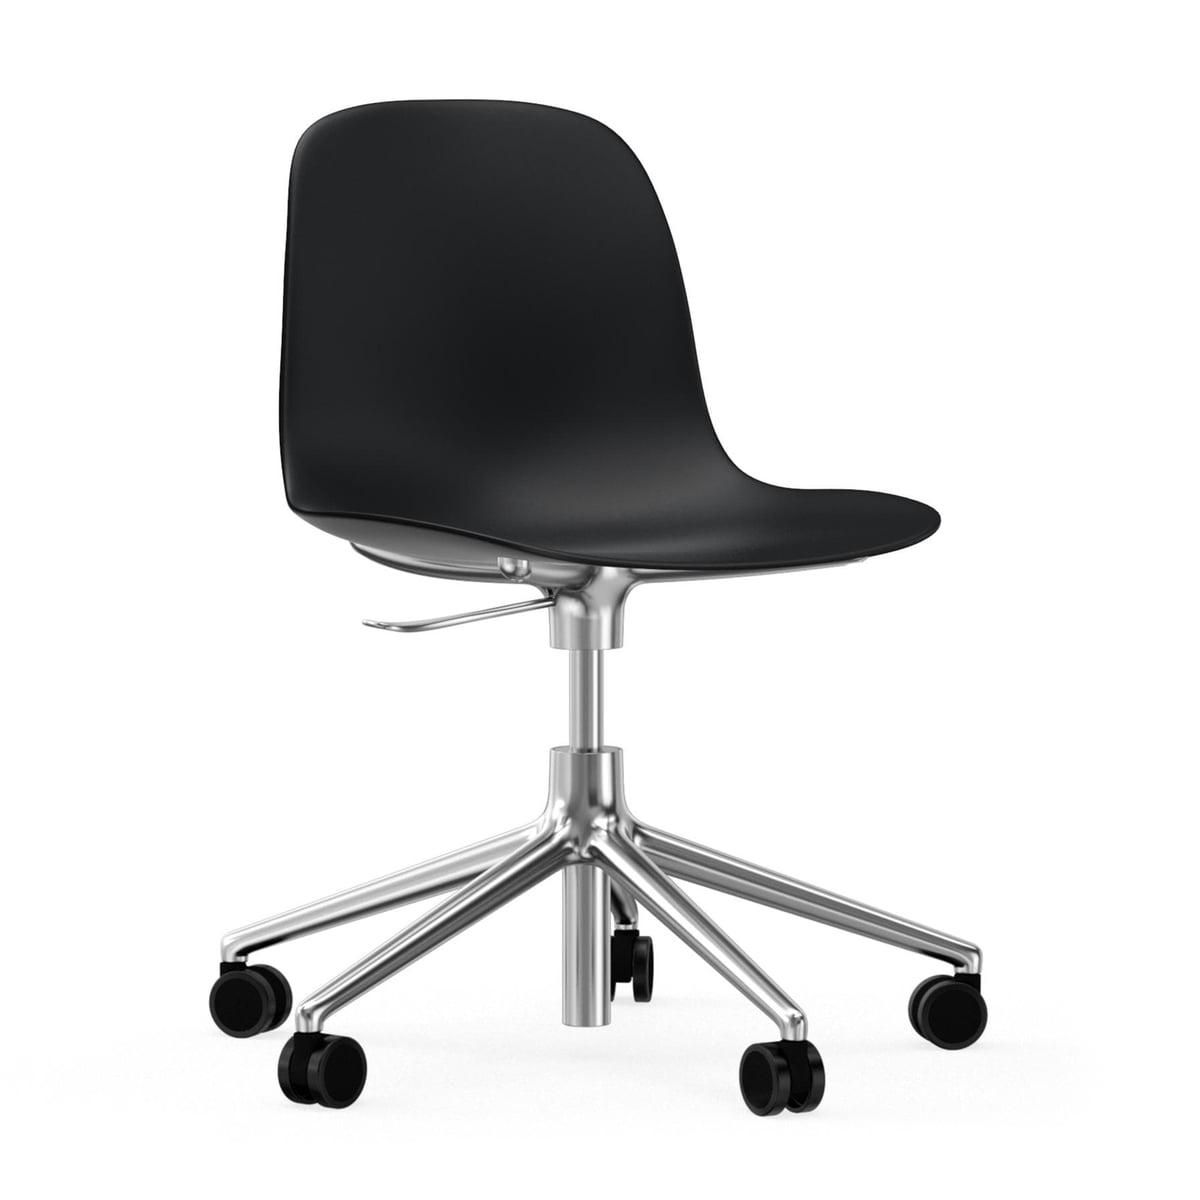 Normann Copenhagen - Form Bürodrehstuhl, Gestell Aluminium / schwarz | Büro > Bürostühle und Sessel  > Bürostühle | Schwarz | Normann Copenhagen